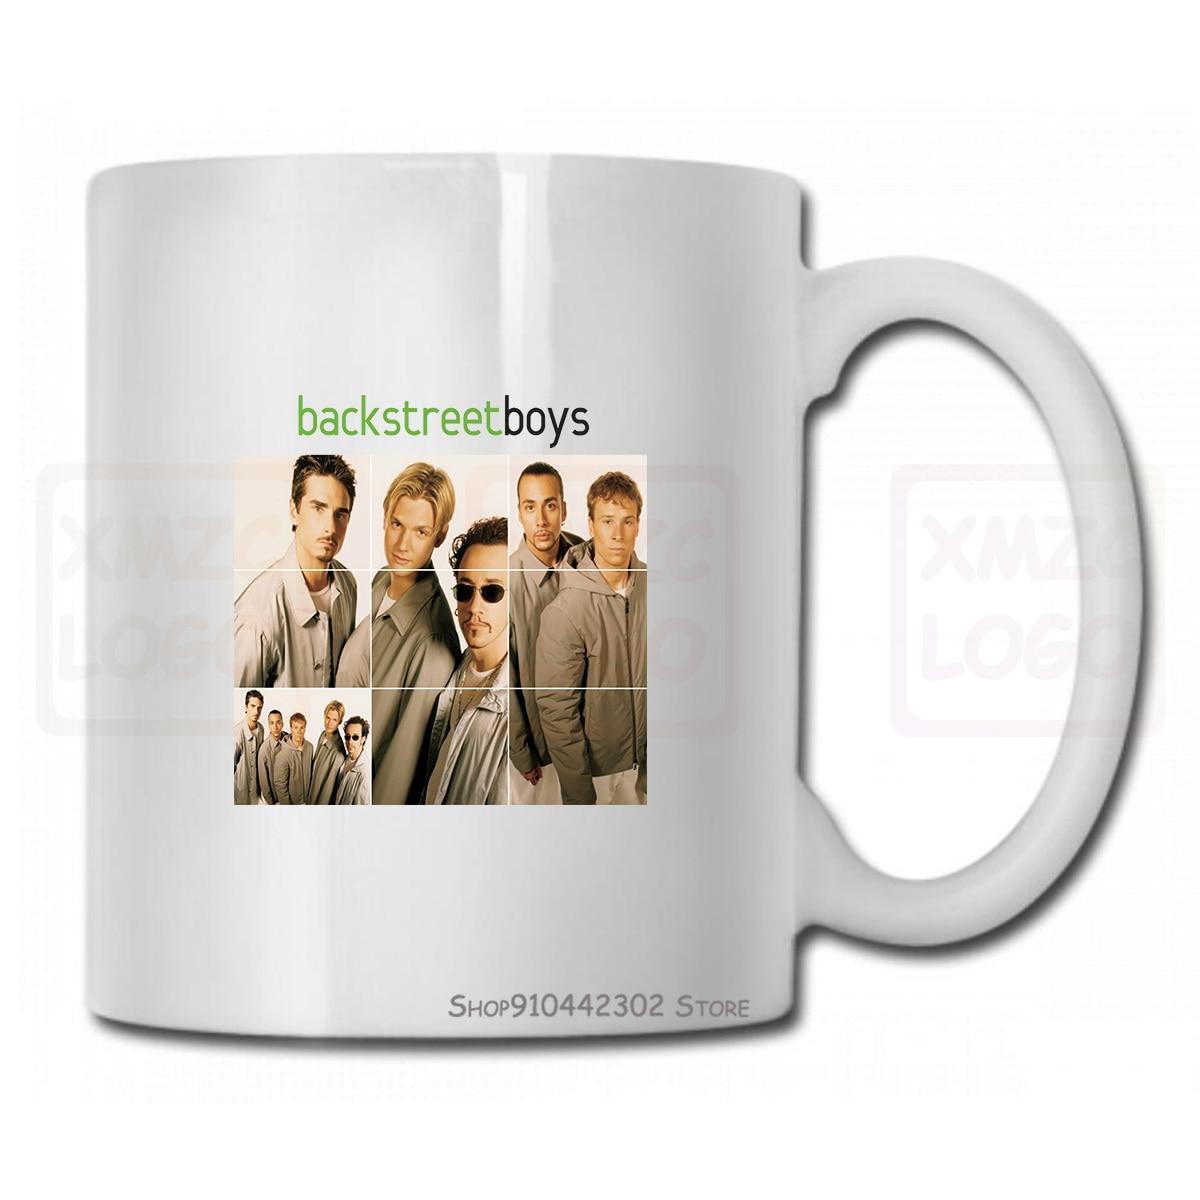 Backstreet Boys American Vocal Group hommes blanc Tmug tasse taille S à 3Xl femmes hommes